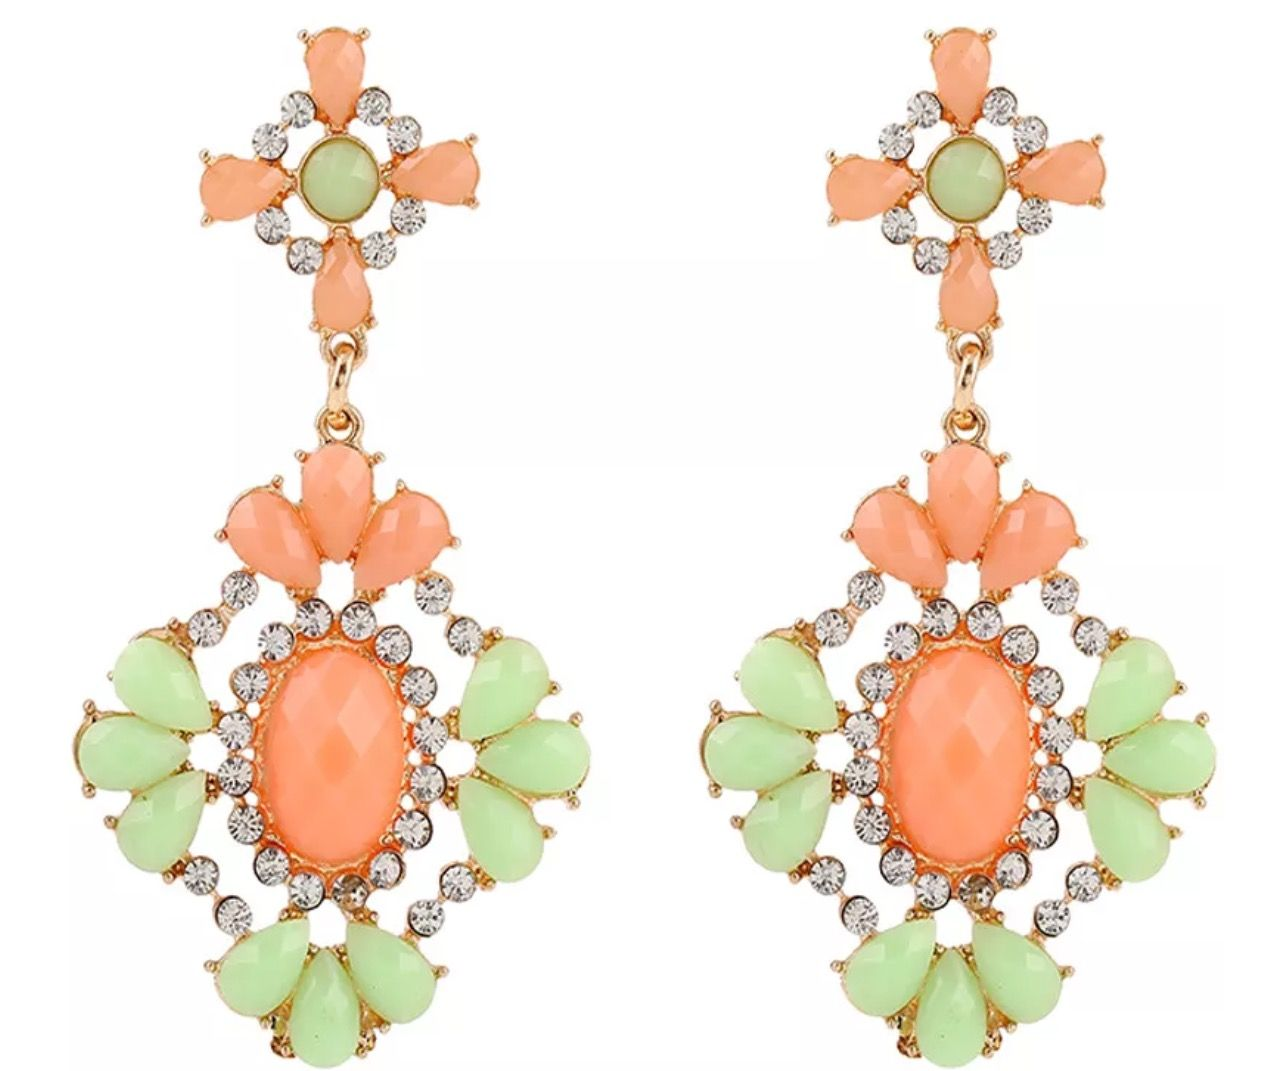 Peach chandelier earring kj jewelry fashion jewelry pinterest peach chandelier earring kj jewelry arubaitofo Images